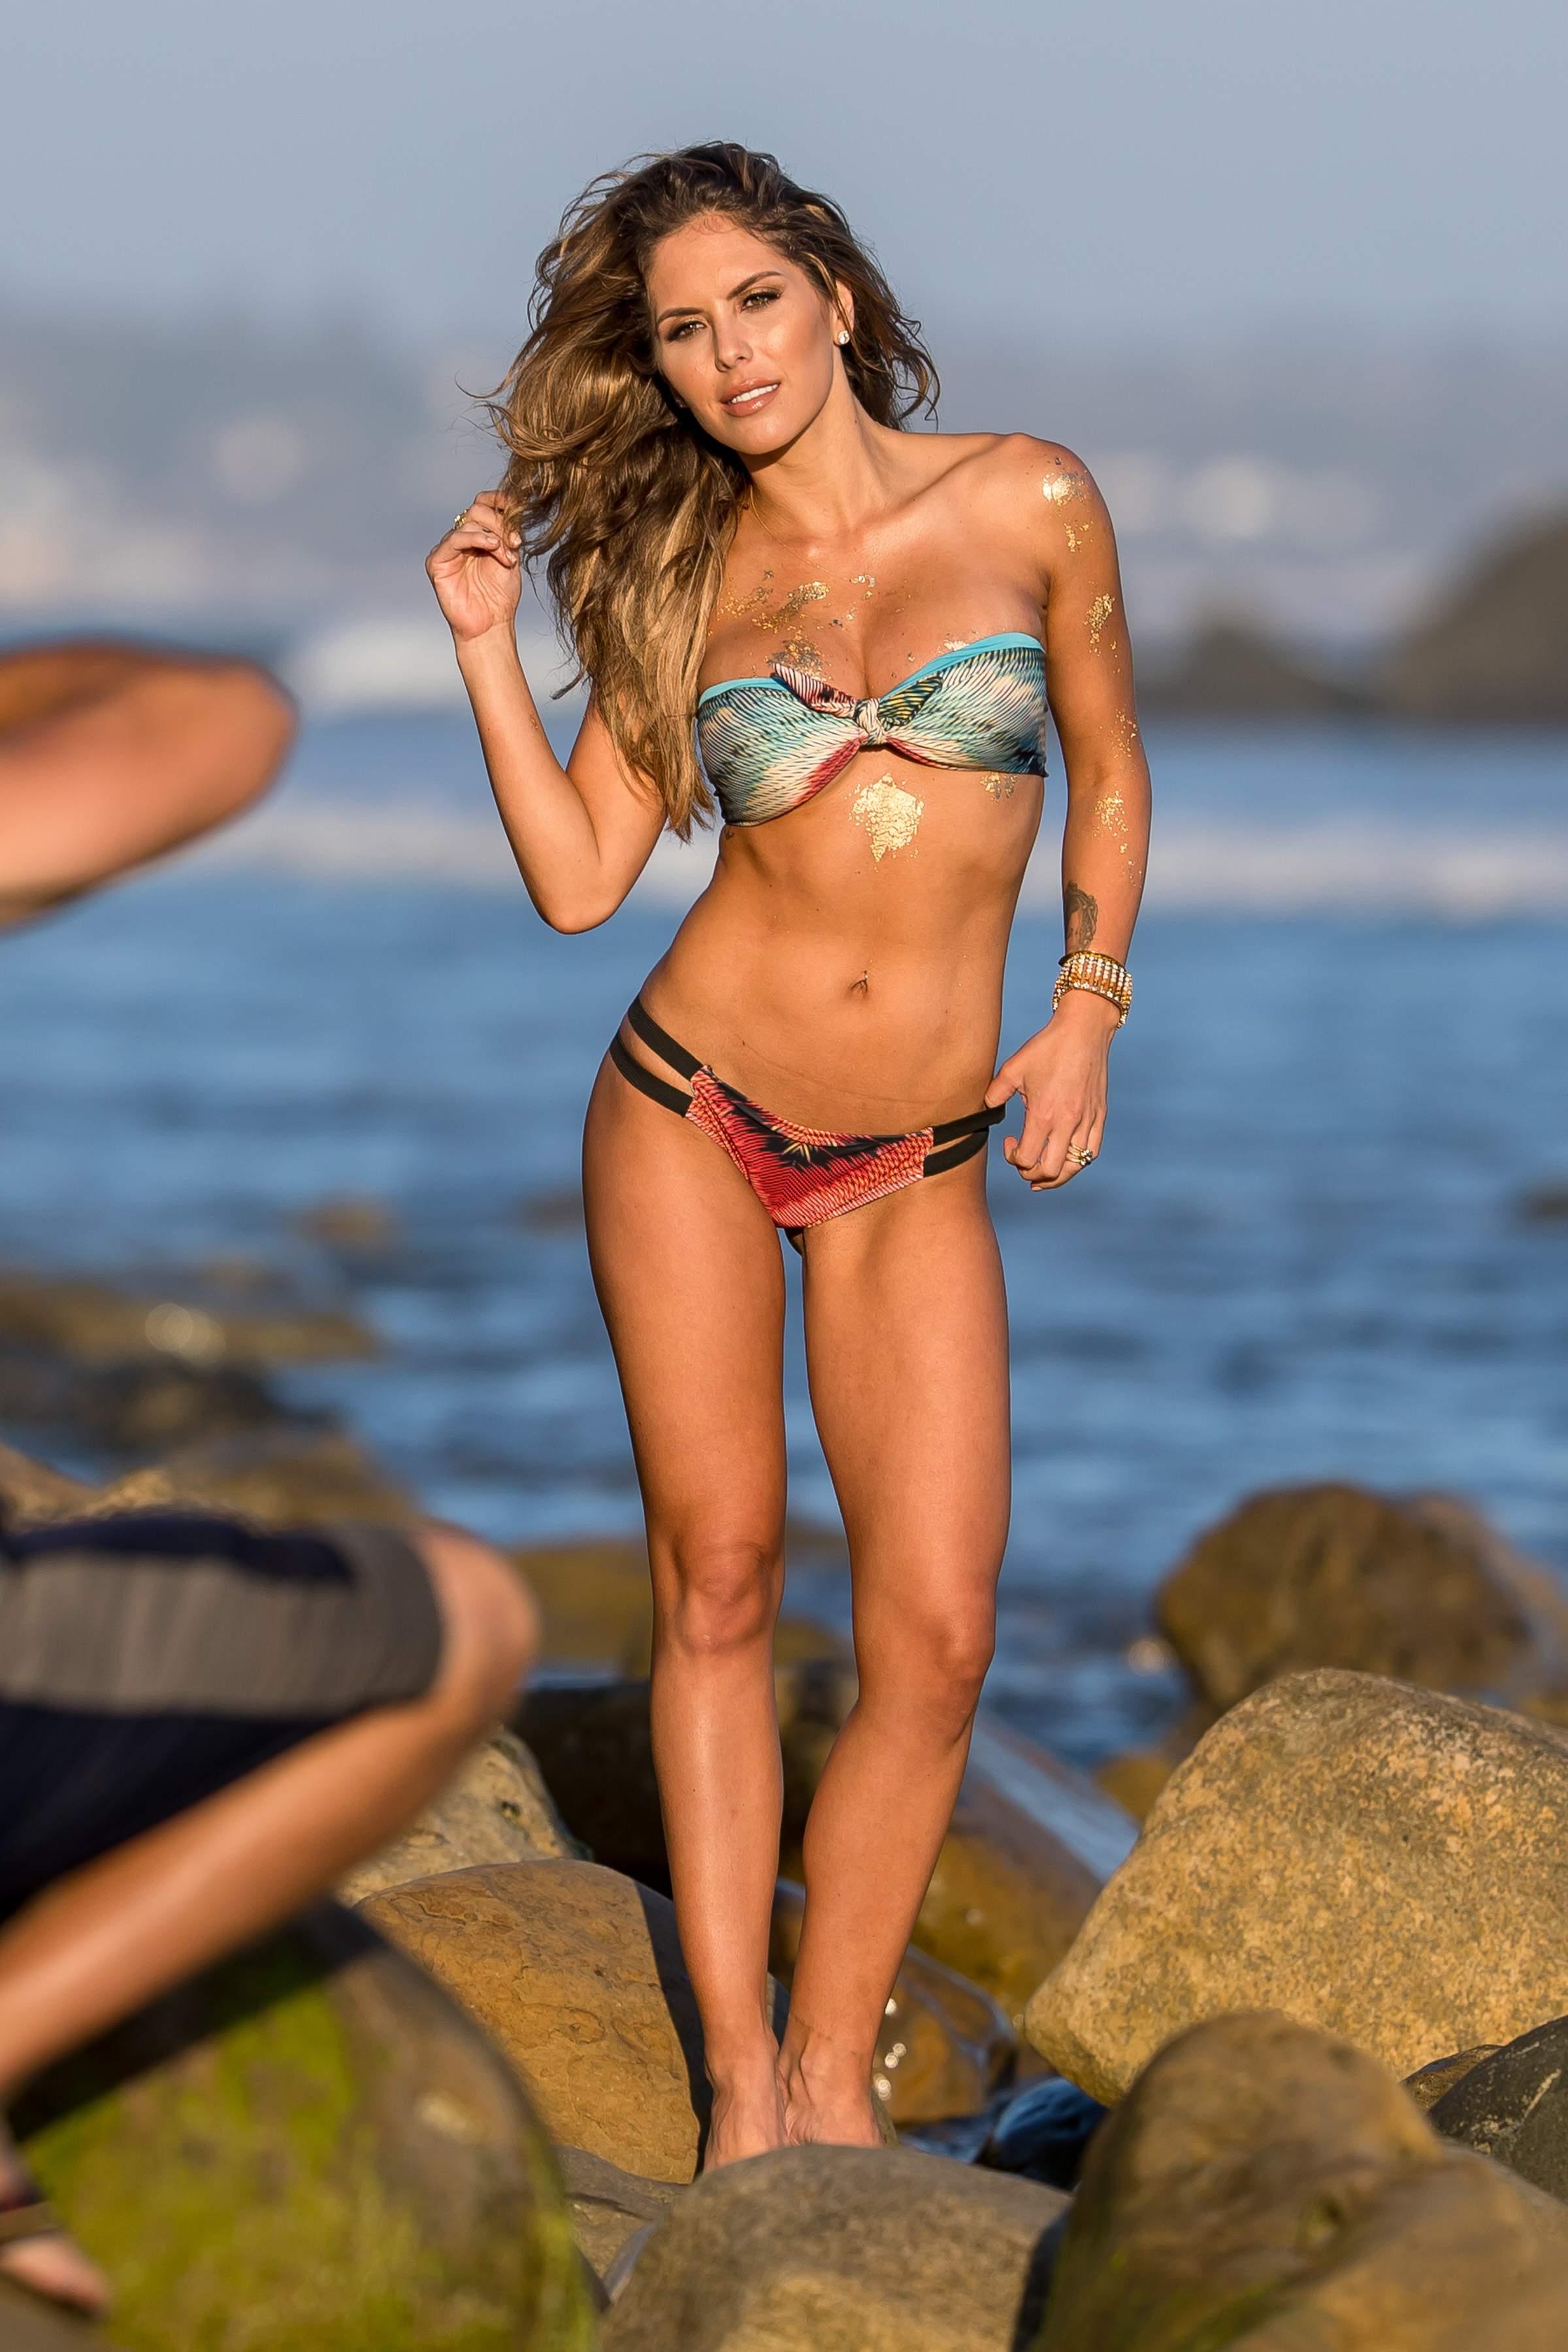 Brittney-Palmer-Sexy-5-thefappeningblog.com_.jpg